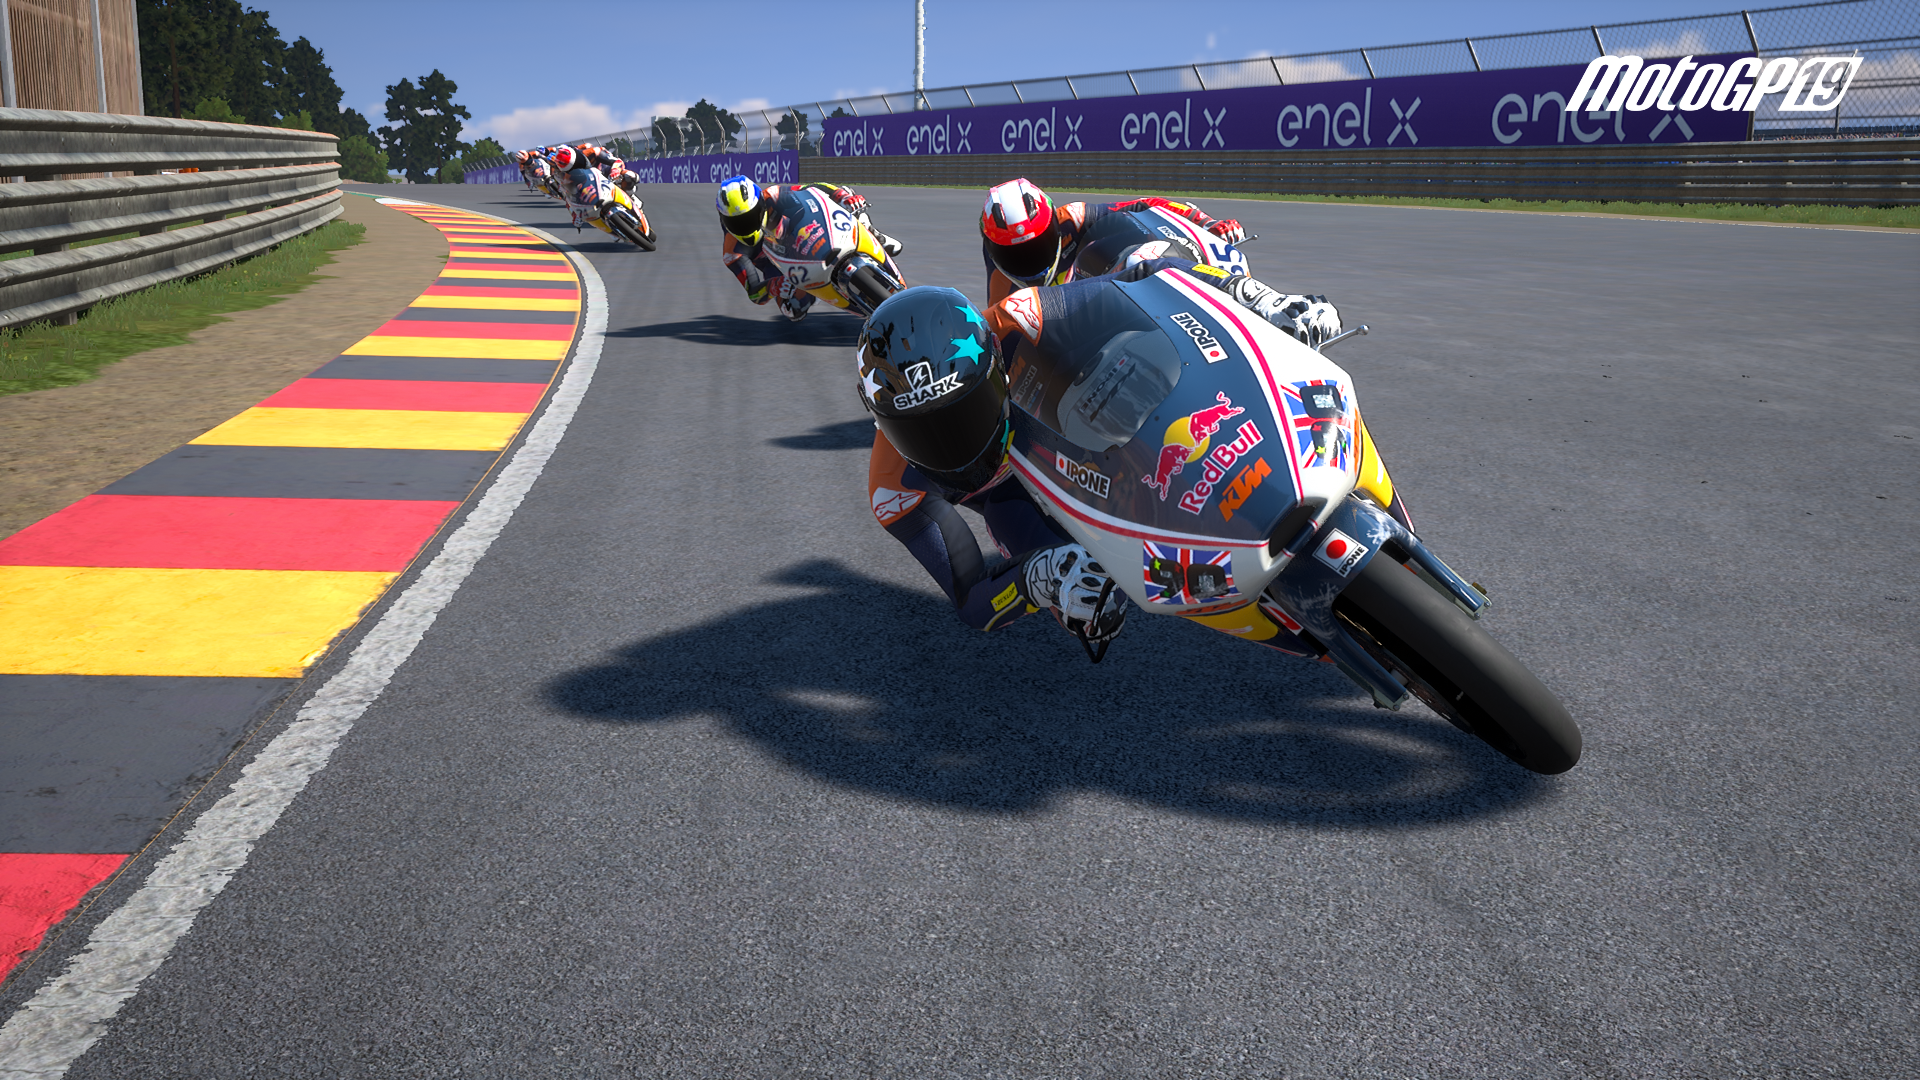 Is Moto GP 19 any good?